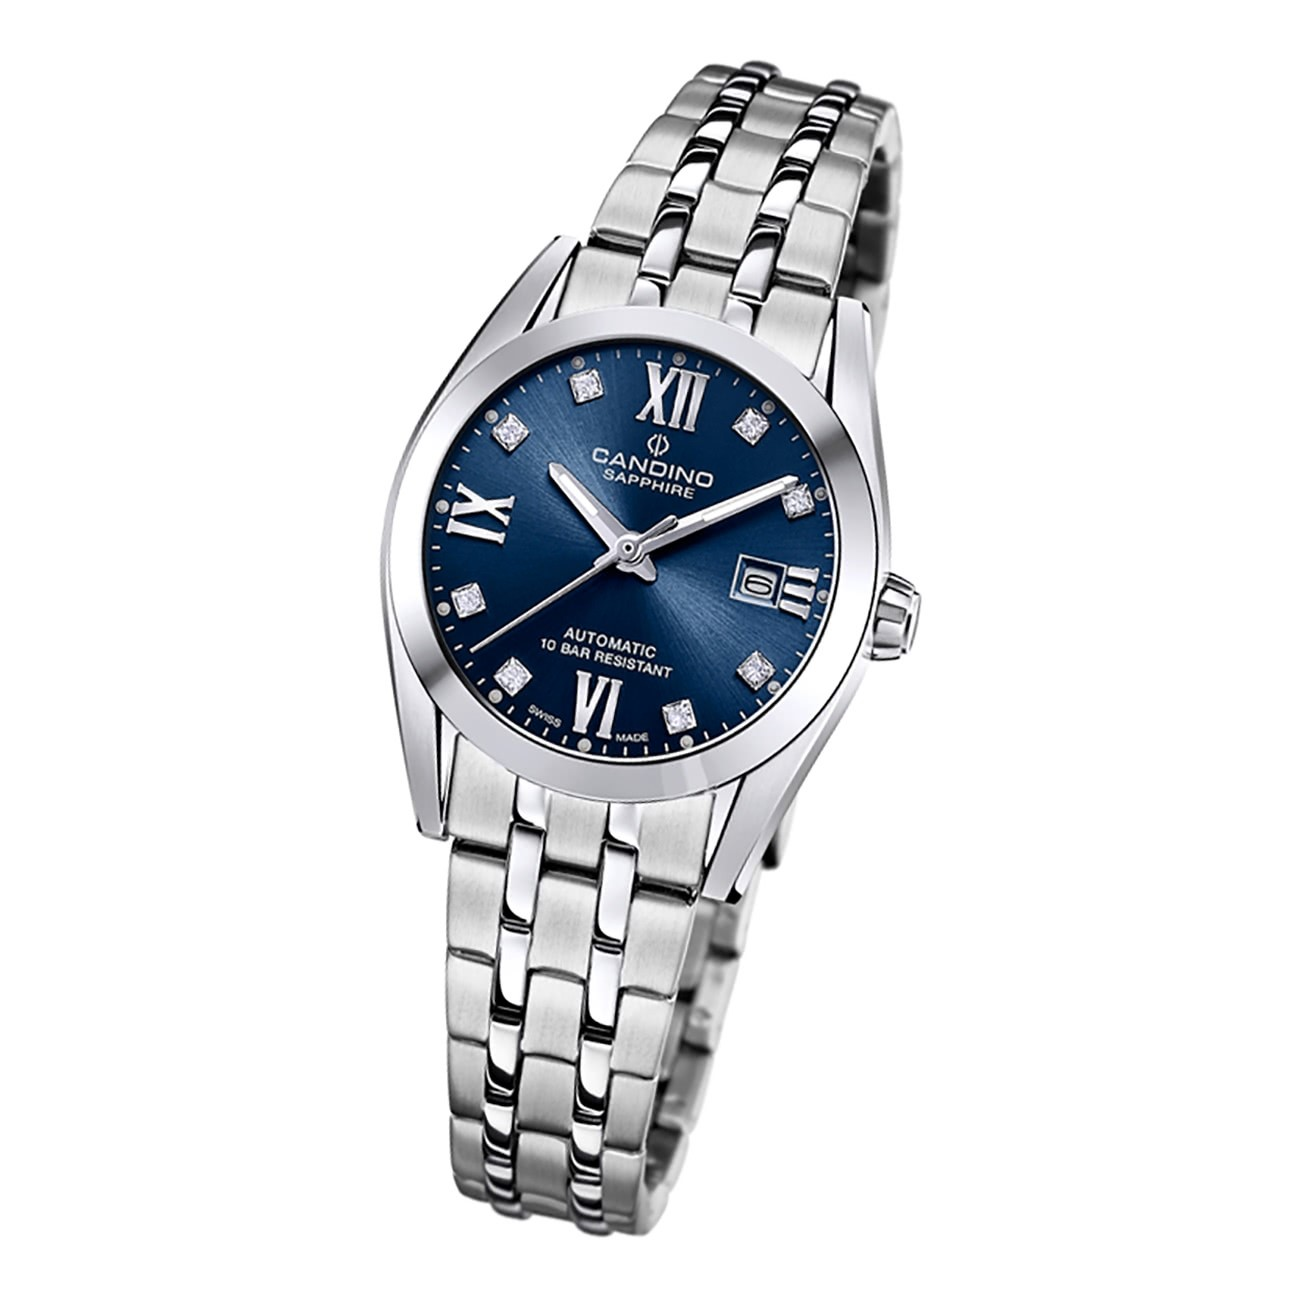 Candino Damen Armbanduhr Automatik C4703/2 Analog Edelstahl silber UC4703/2